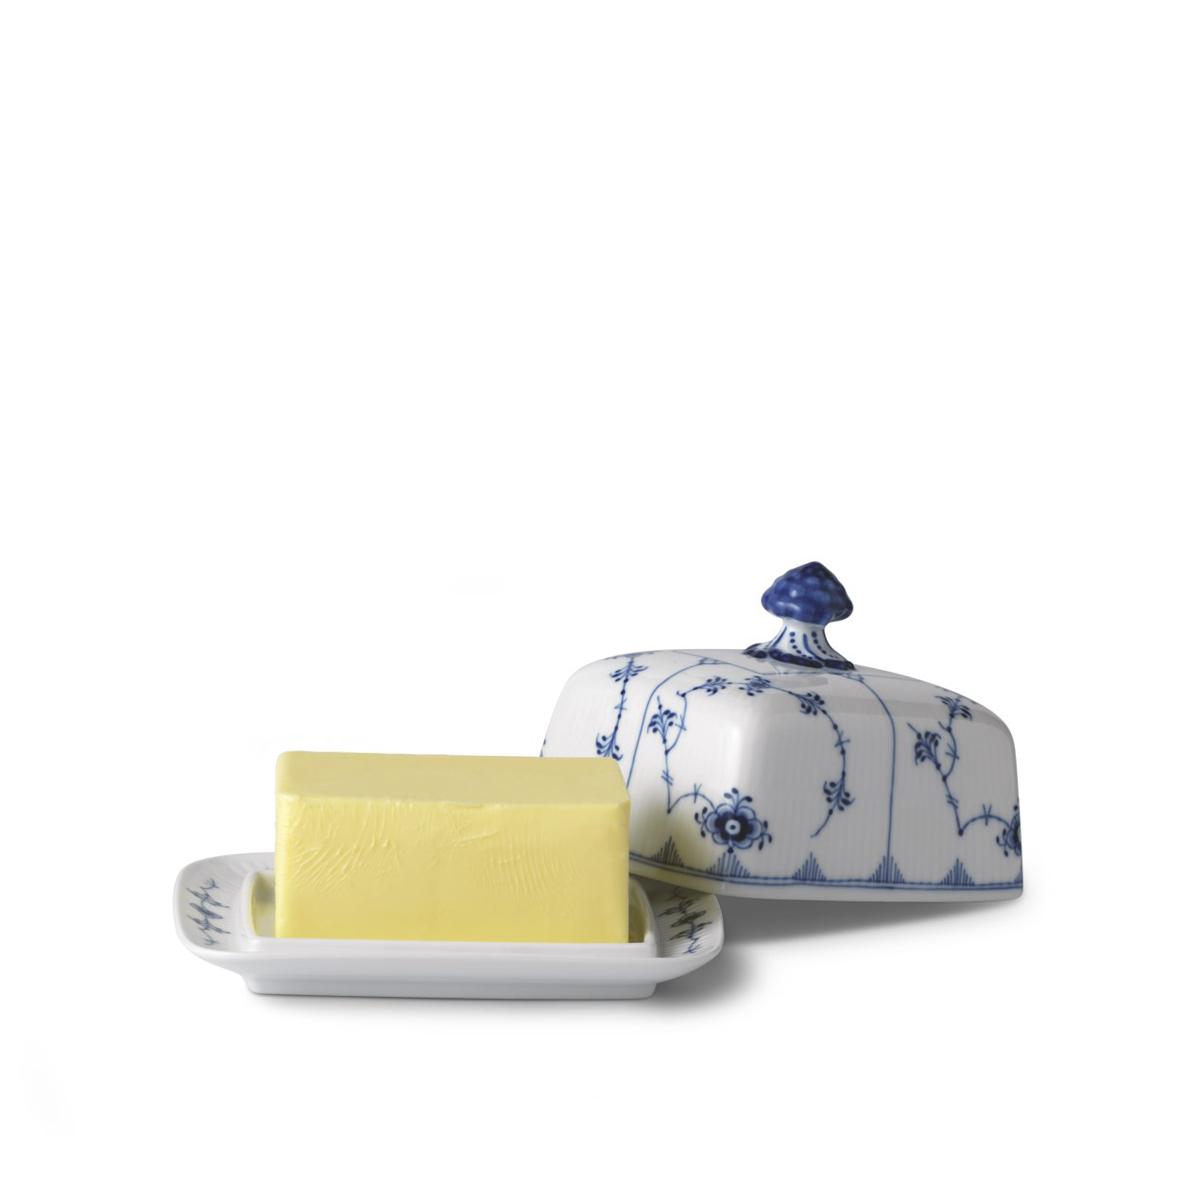 Royal Copenhagen, Blue Fluted Plain Butter Dish 14oz.